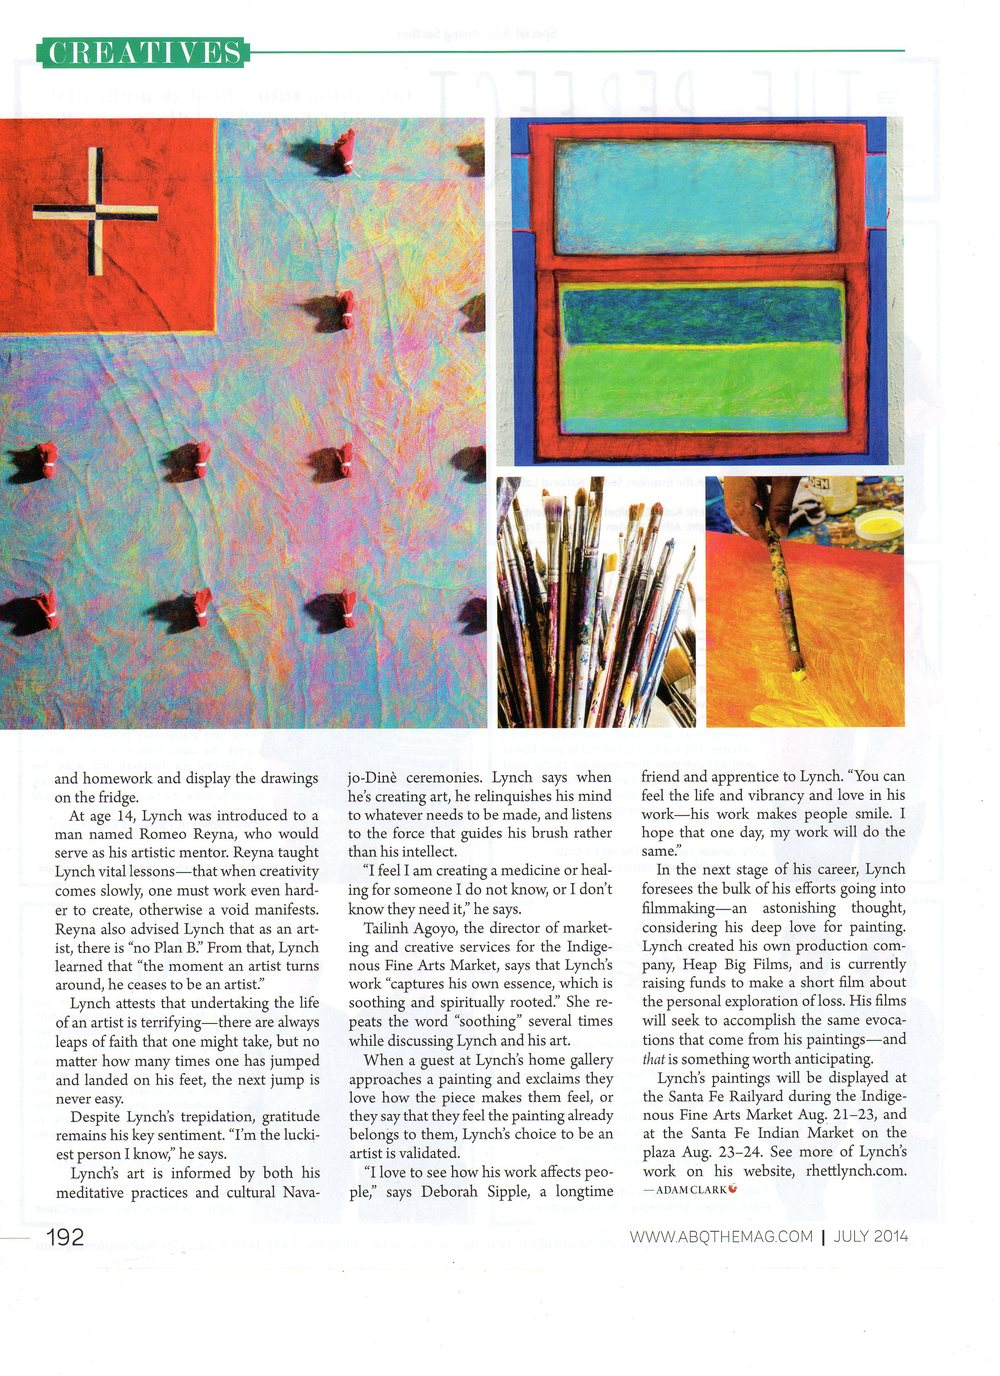 abq the magazine 2014 p192